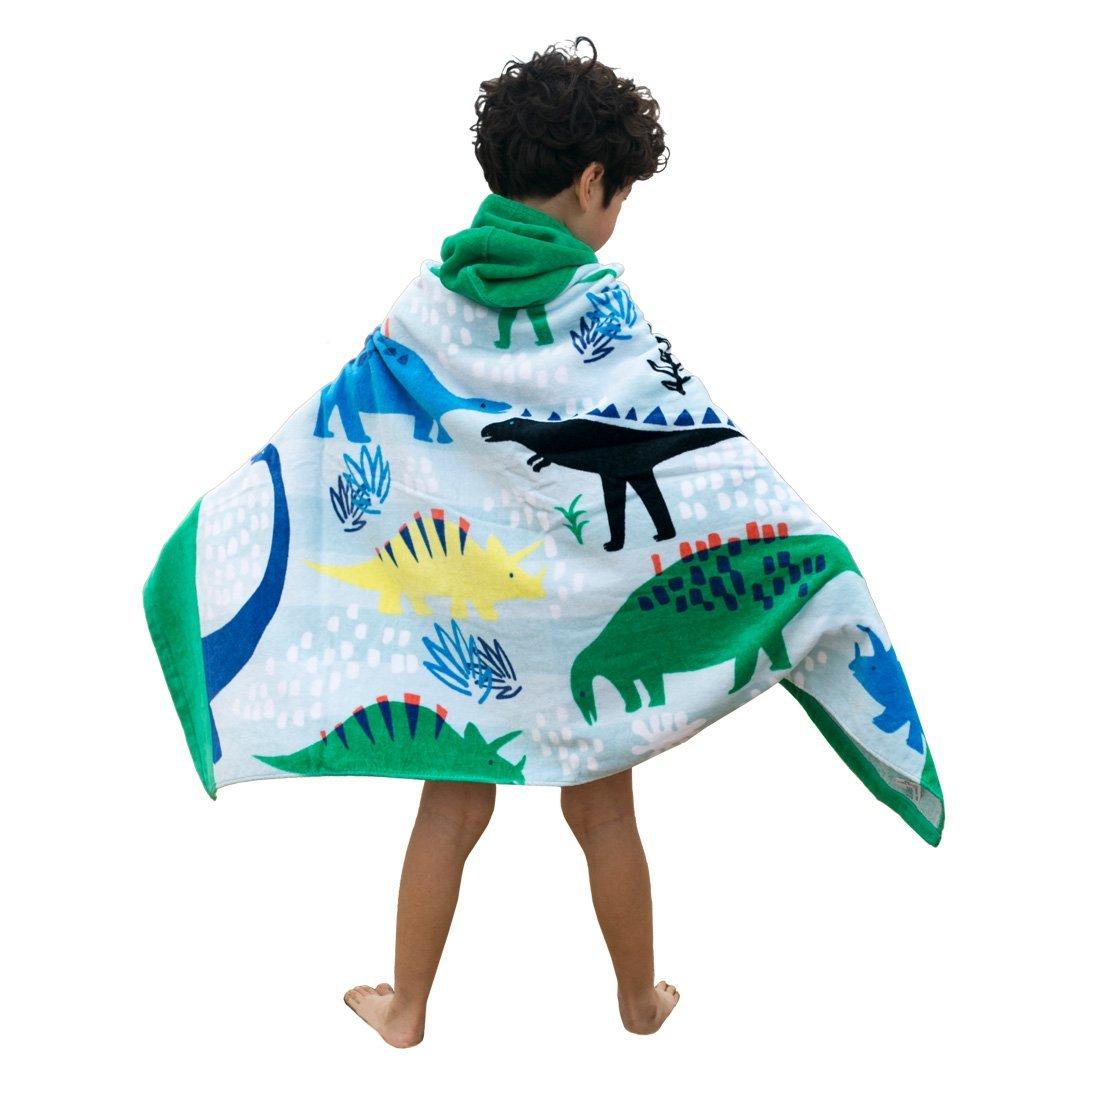 Artown Kids Bath Towel, Ultra Soft Hooded Poncho Swim Pool Beach with Cute Cartoon Animal for Boys Girls - 100% Organic Cotton Bathrobes (Dinosaur)